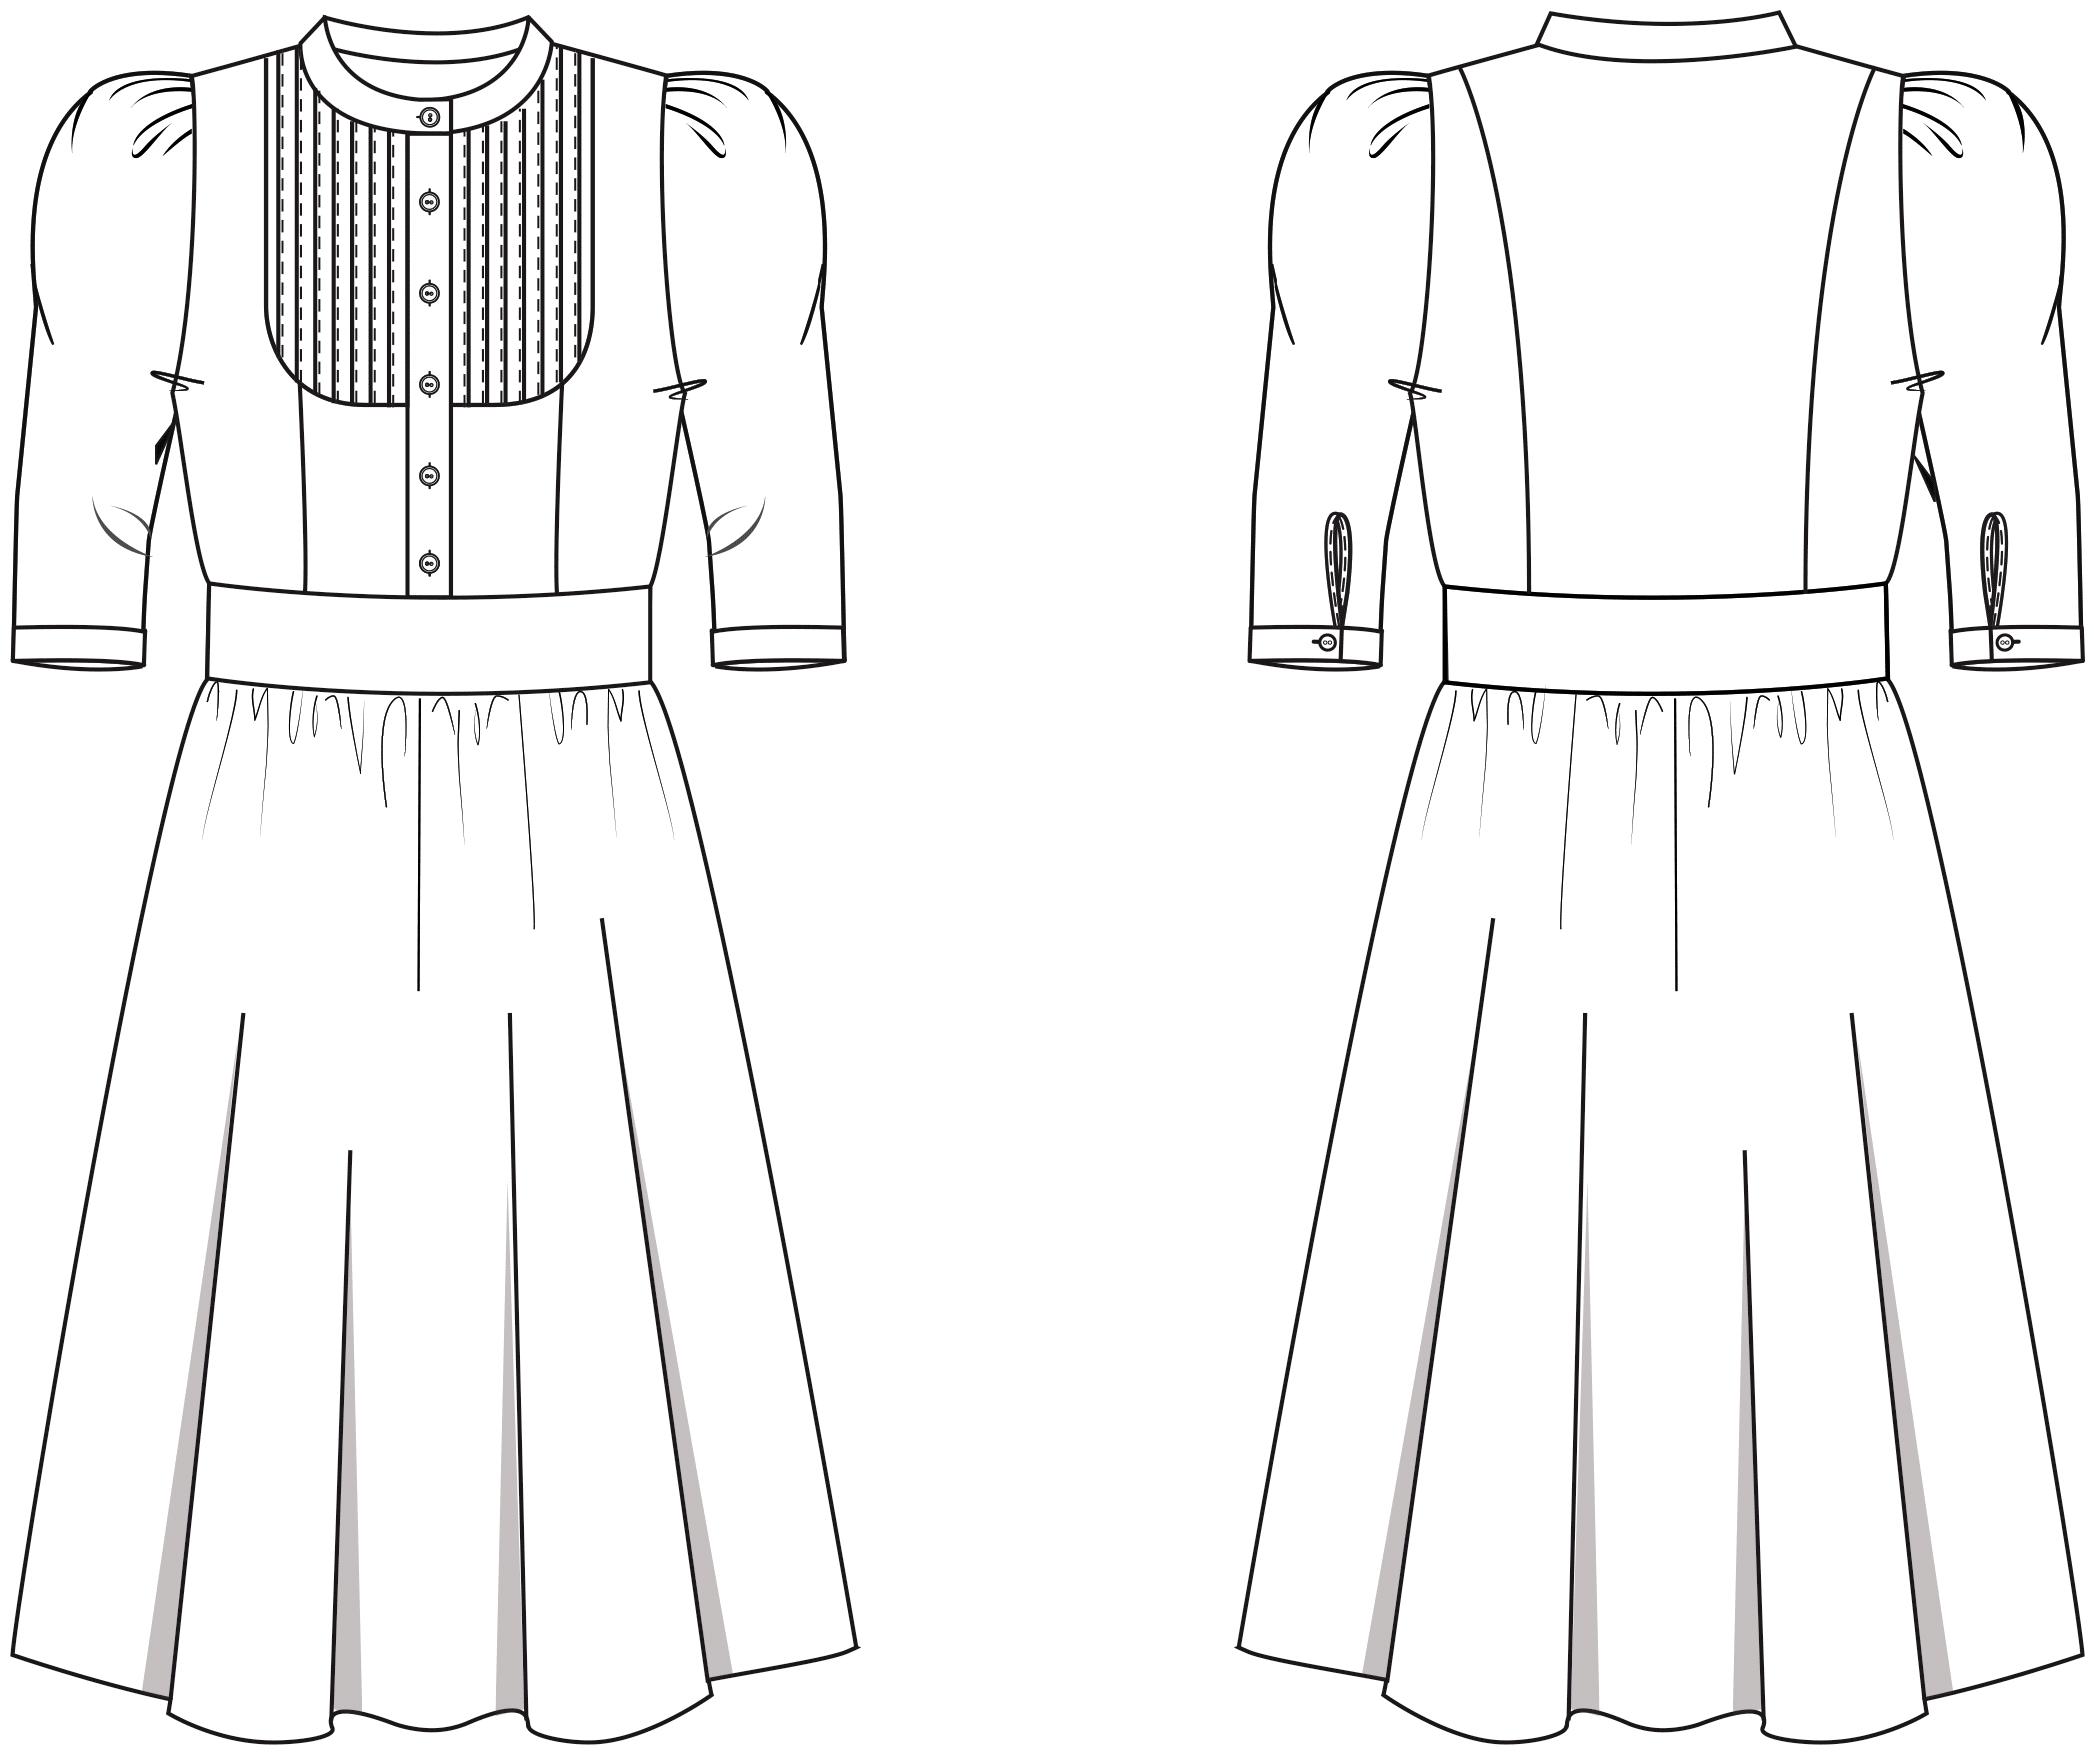 schnittmuster kleider mit puffärmel › m.müller & sohn